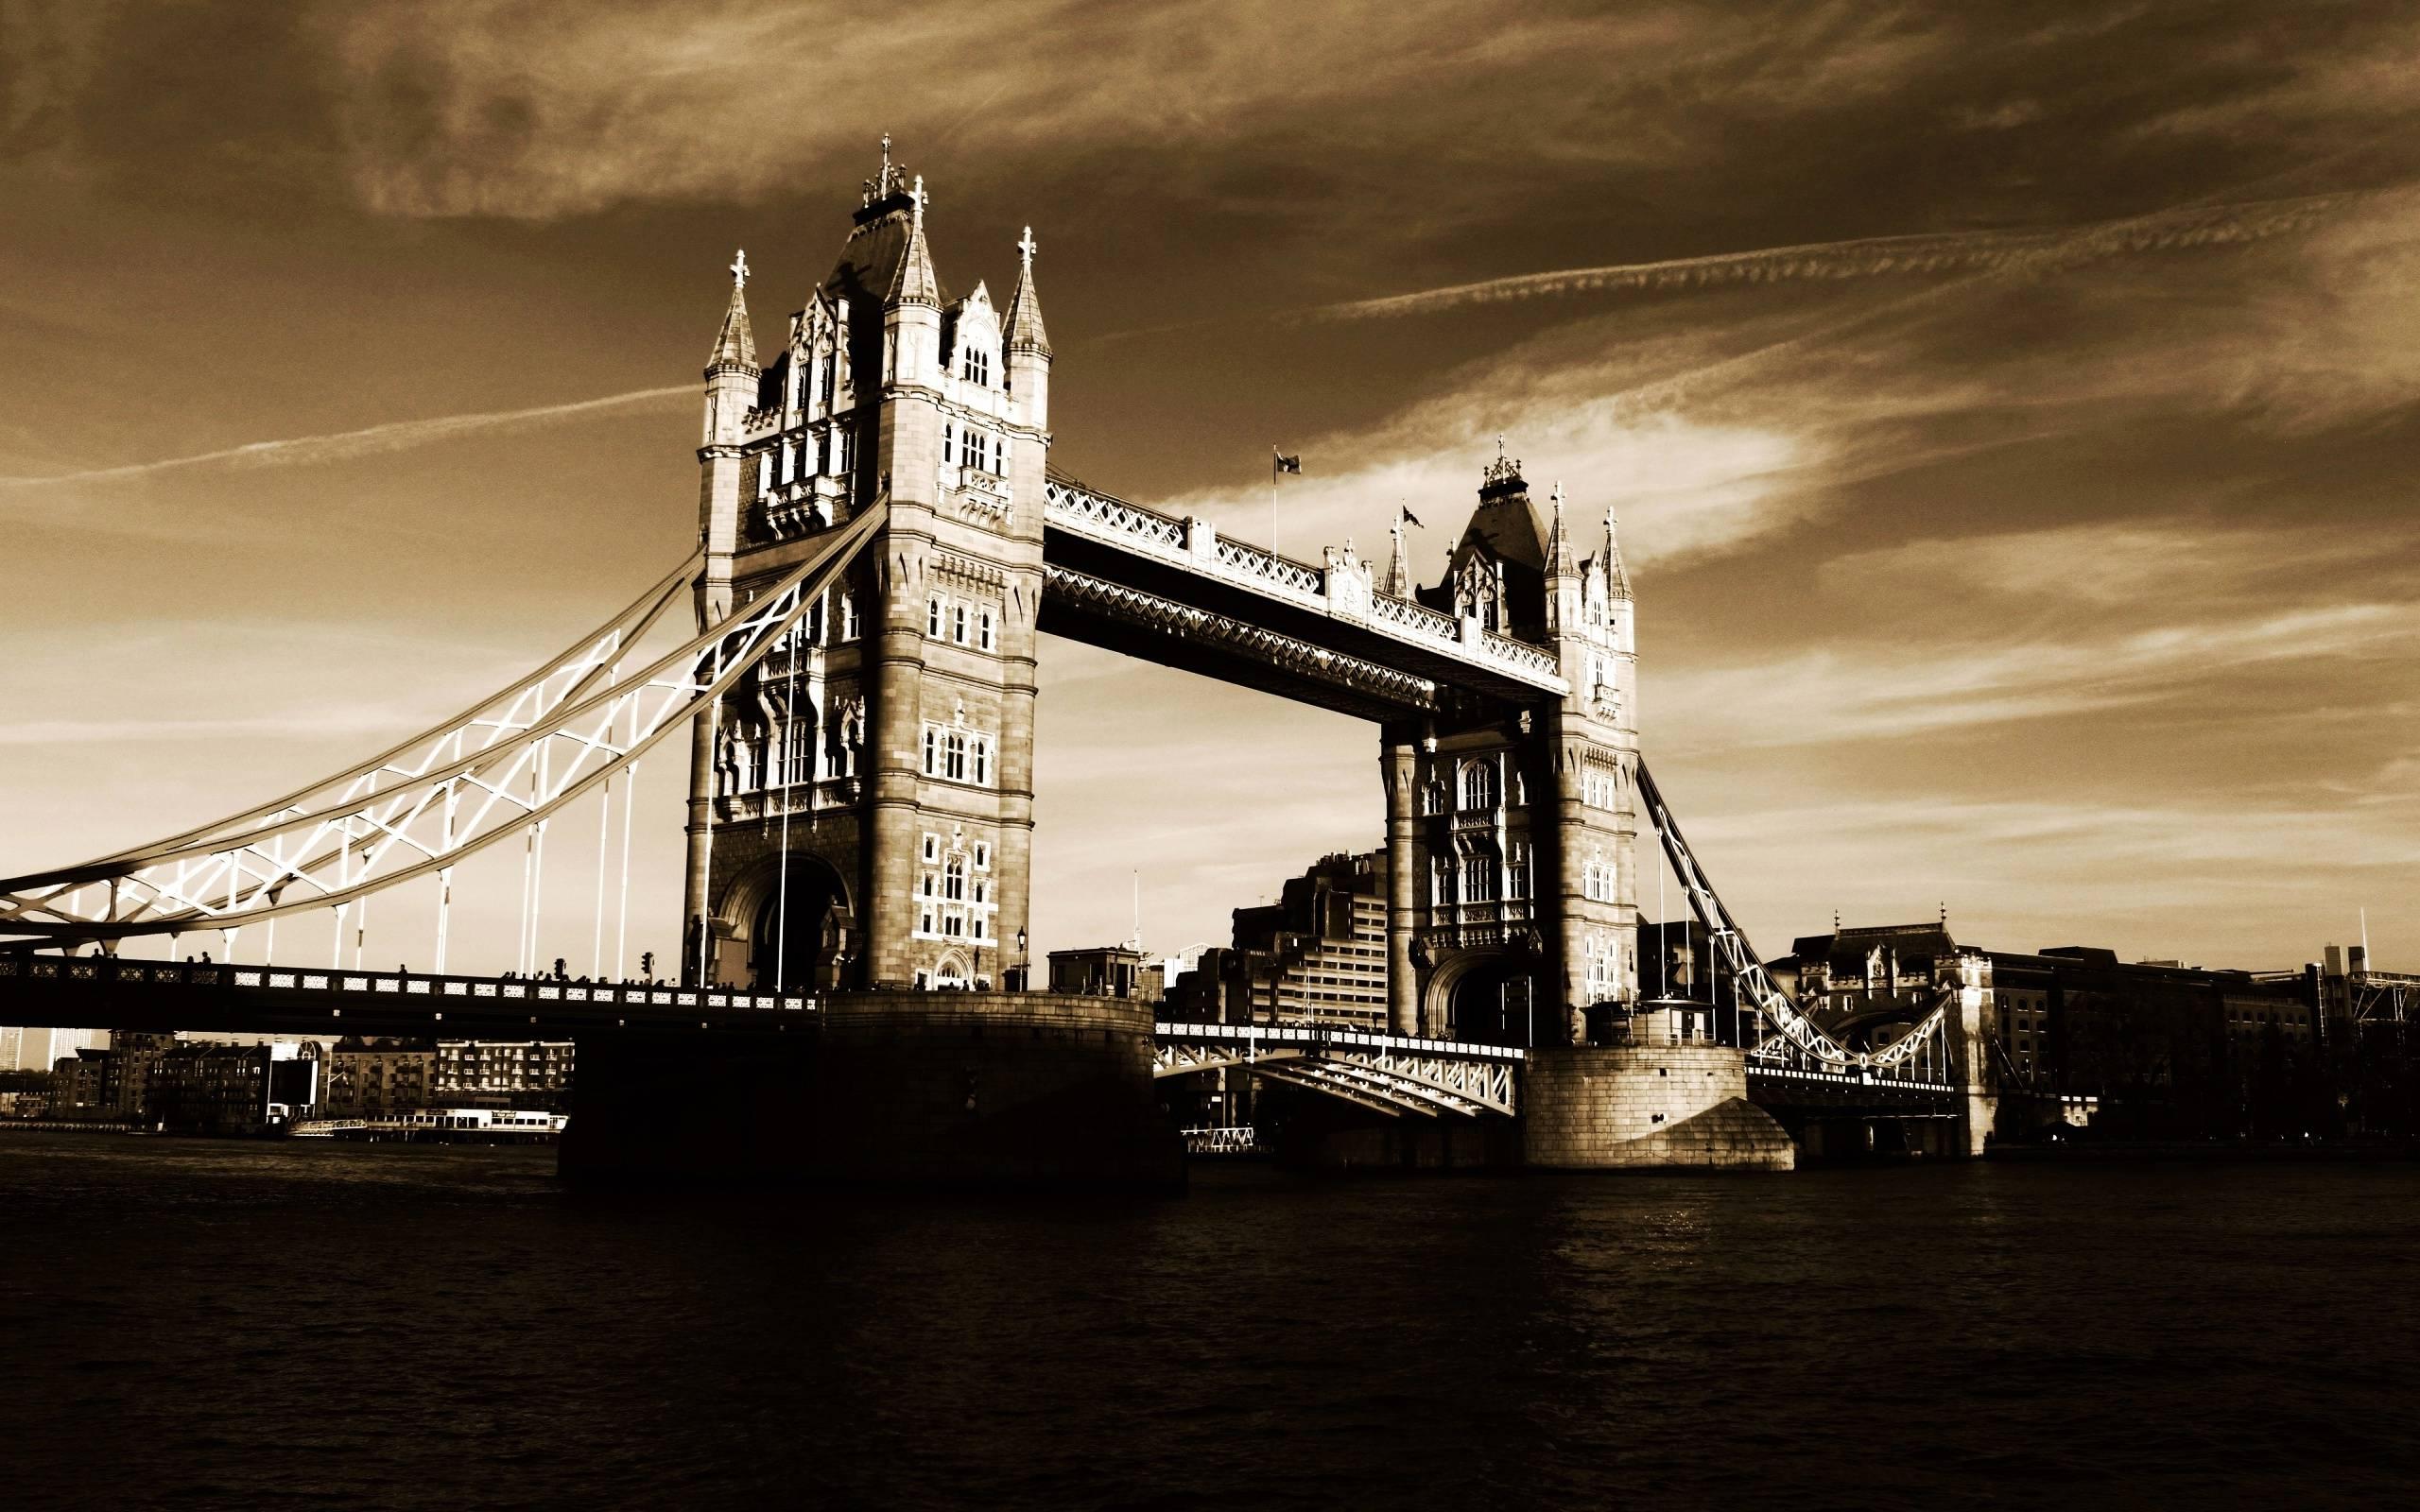 wallpaper bridge london scenic - photo #38